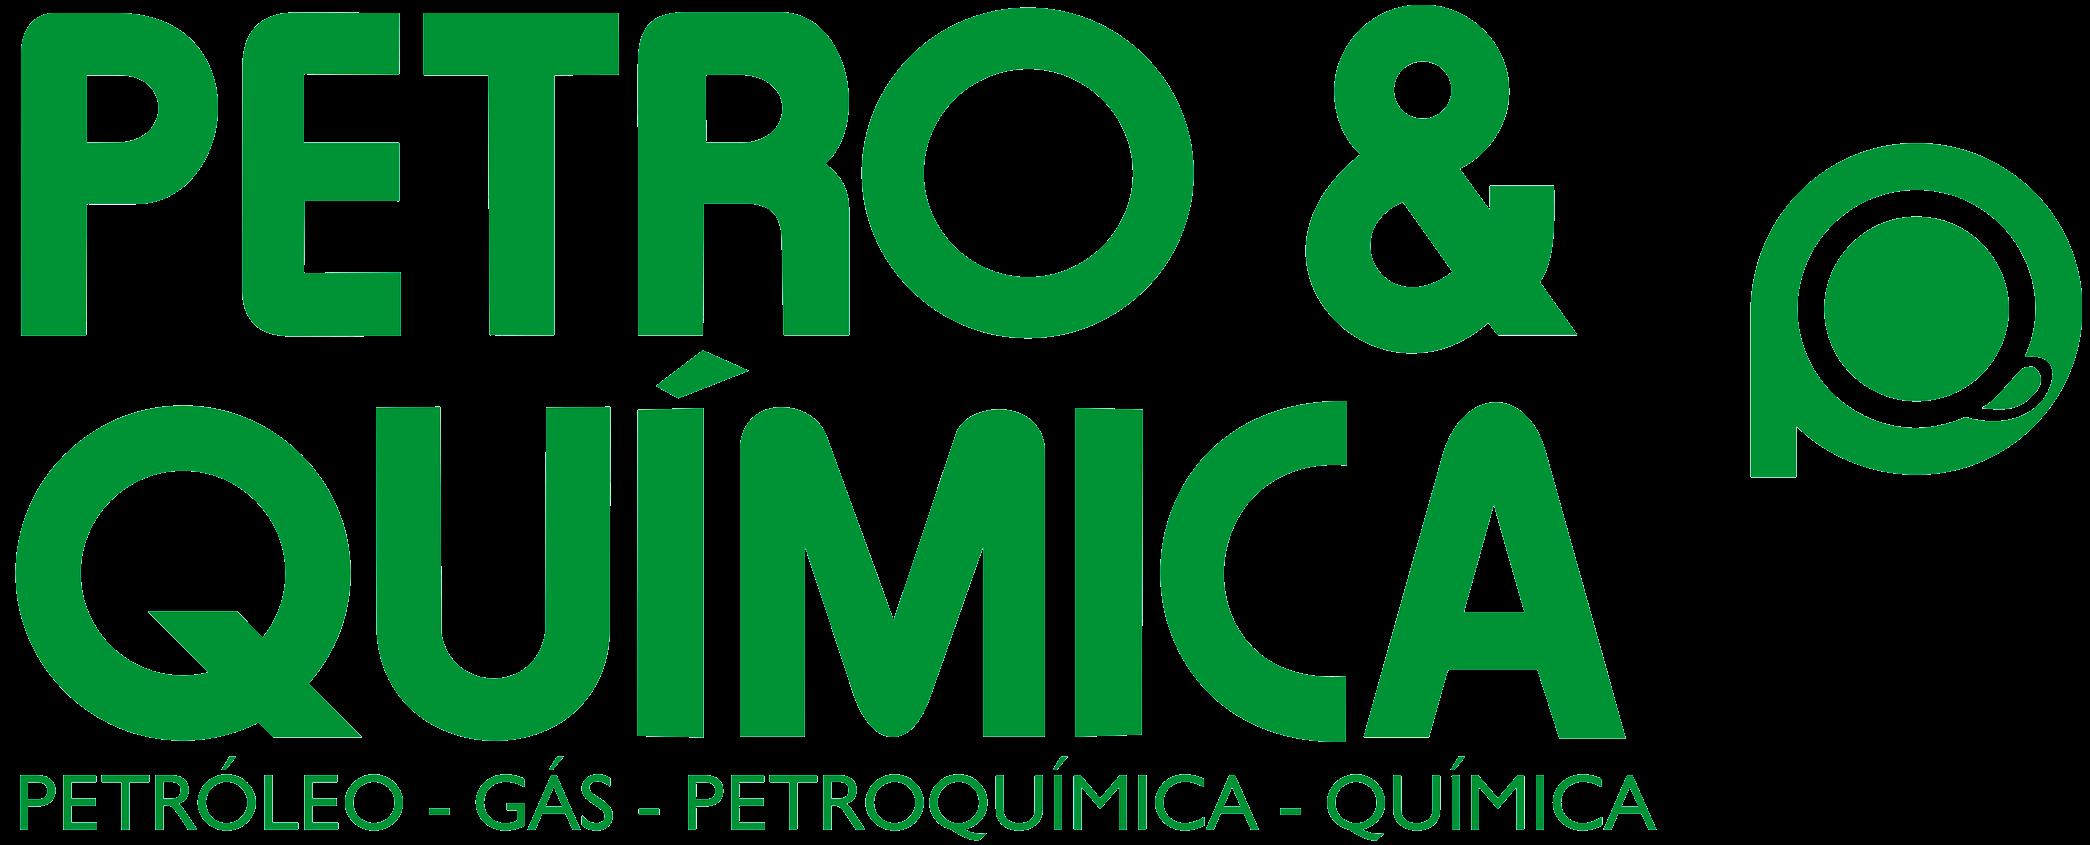 Petro & Química